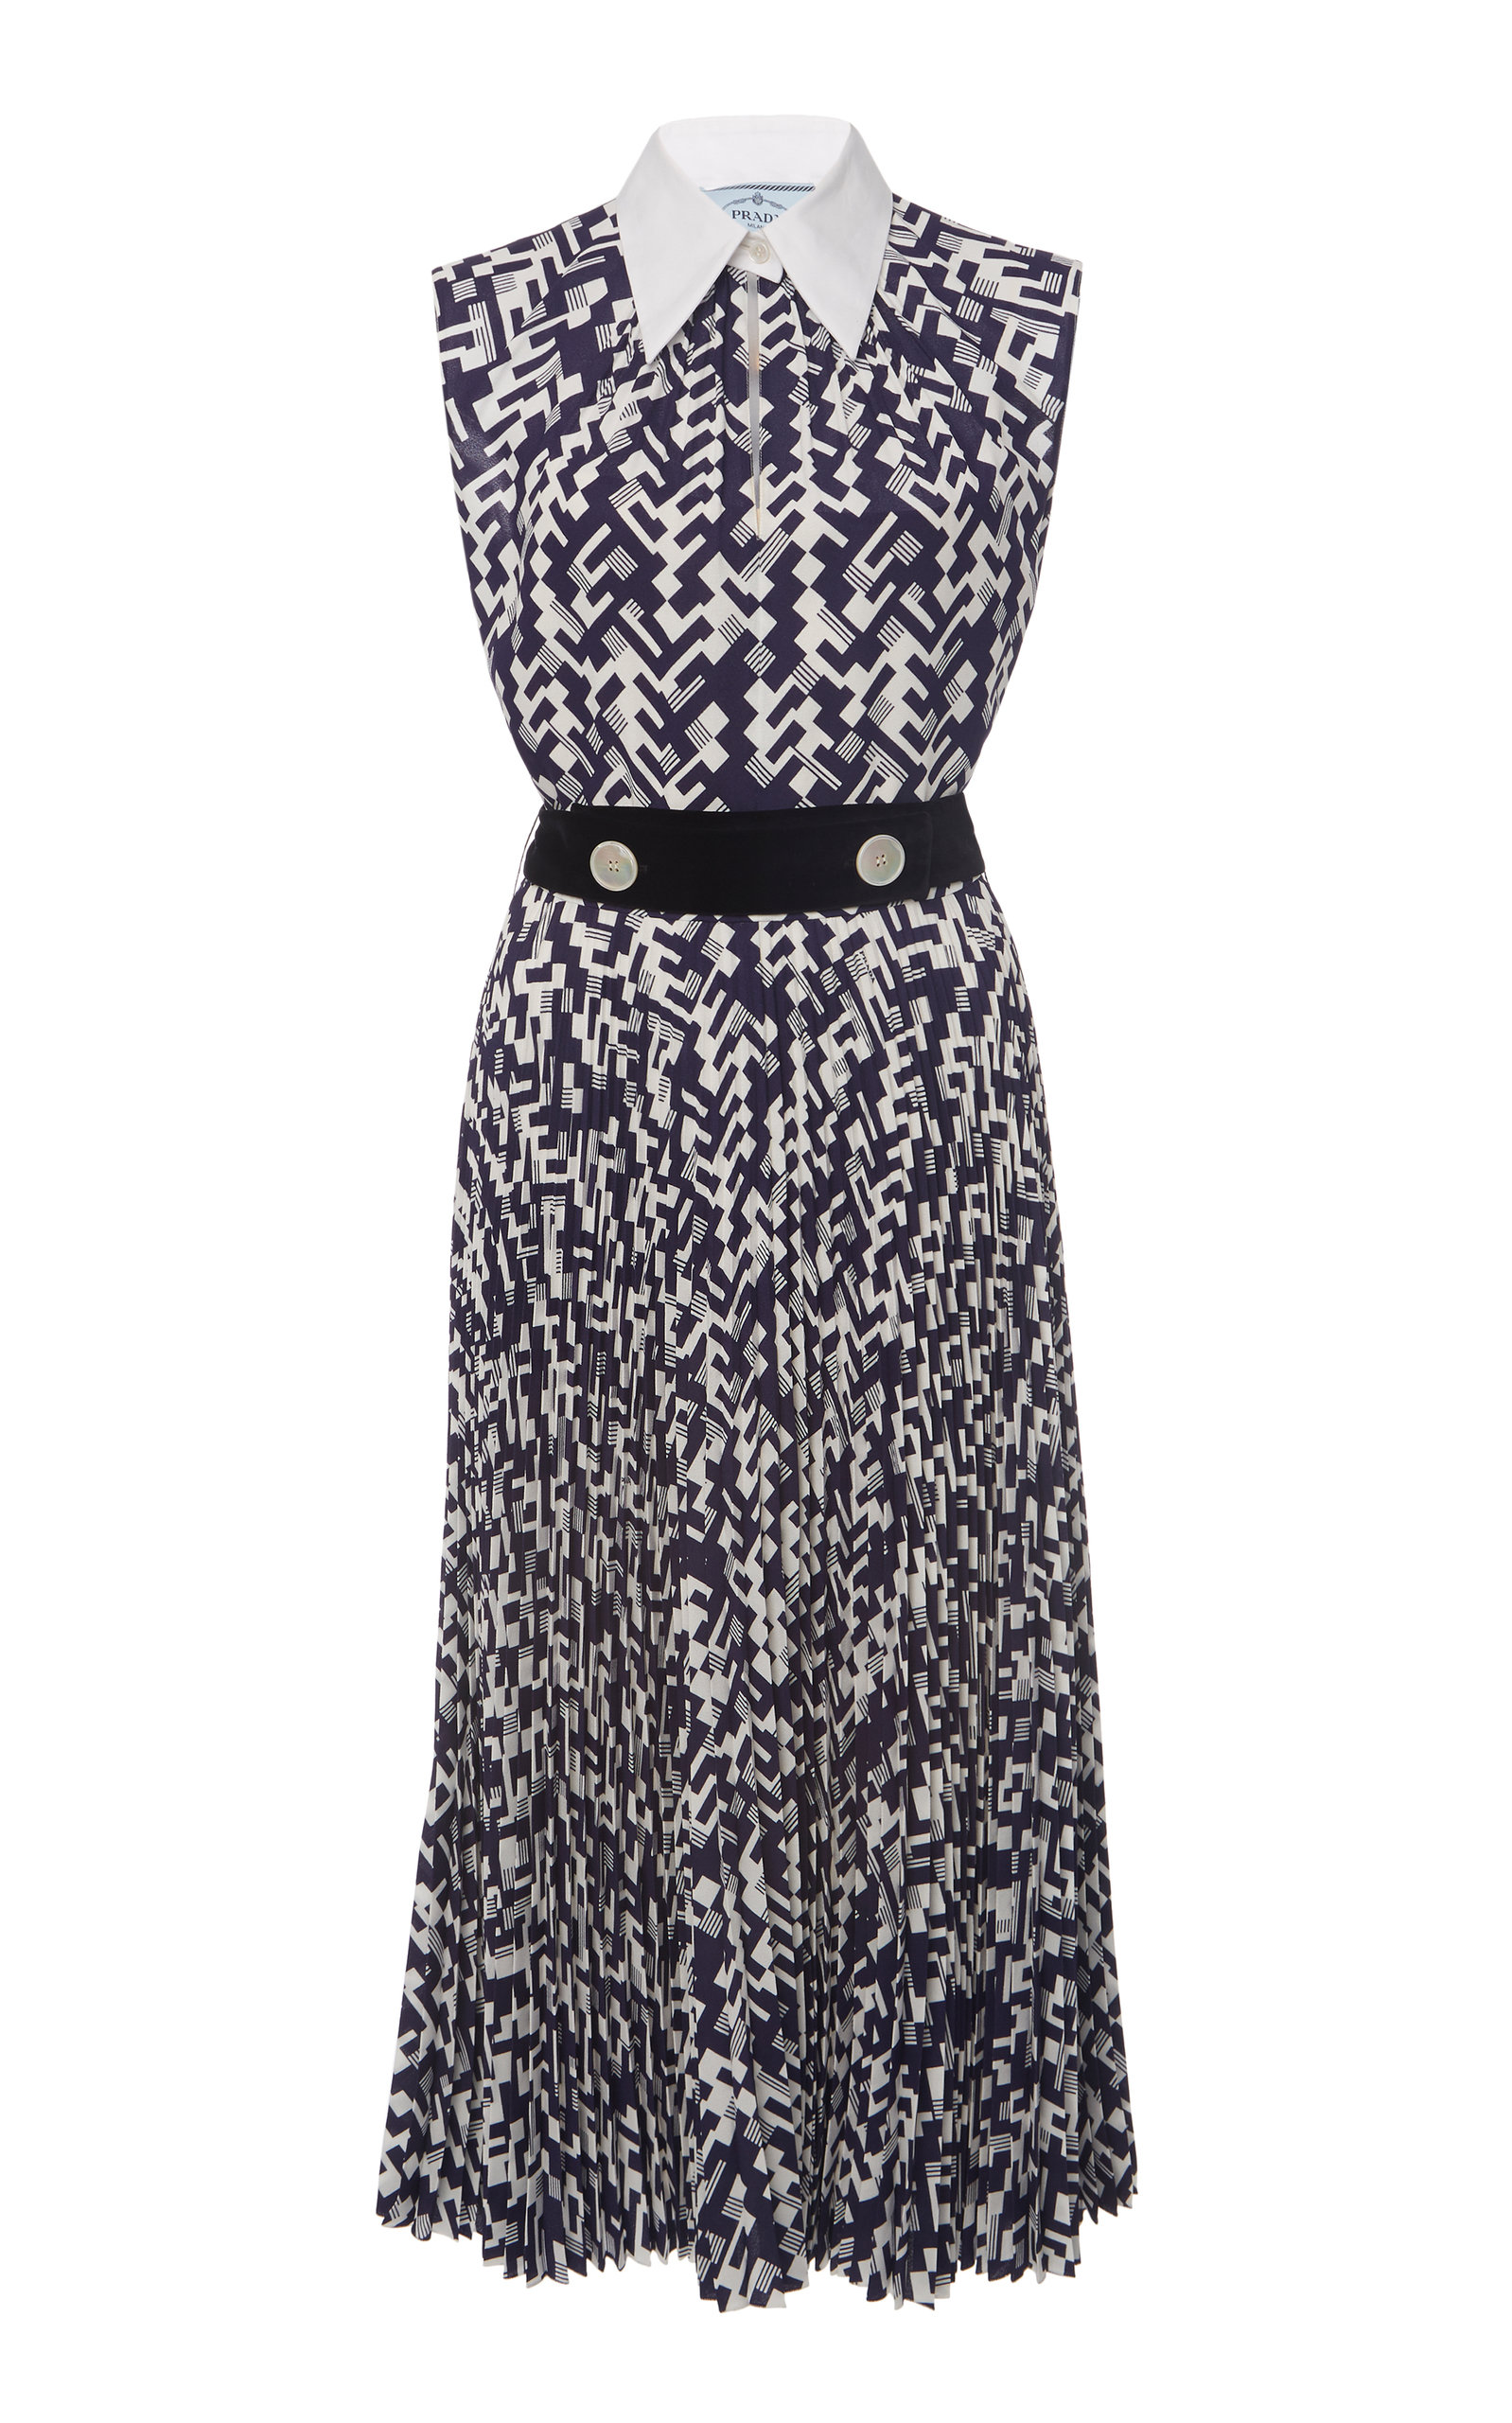 Buy Prada Printed Collared Dress online, shop Prada at the best price